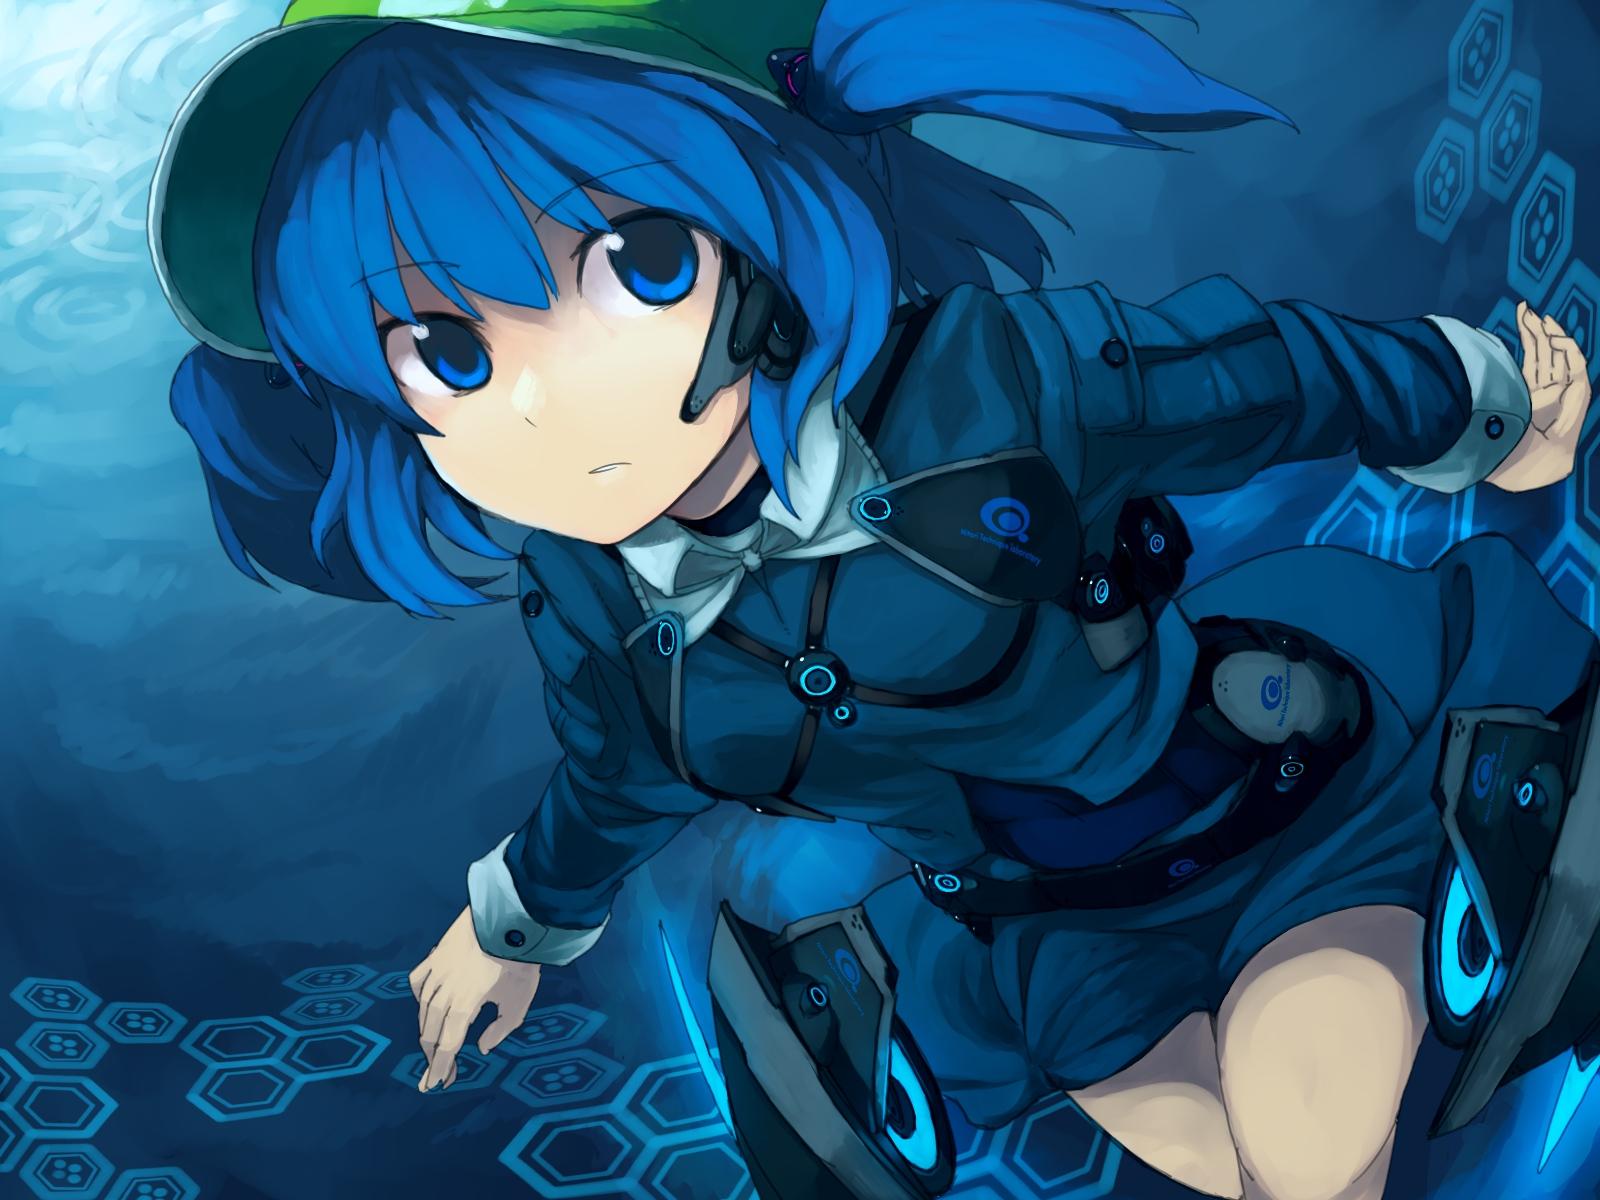 blue_eyes blue_hair hat headphones kawashiro_nitori kitsune_(artist) touhou underwater water